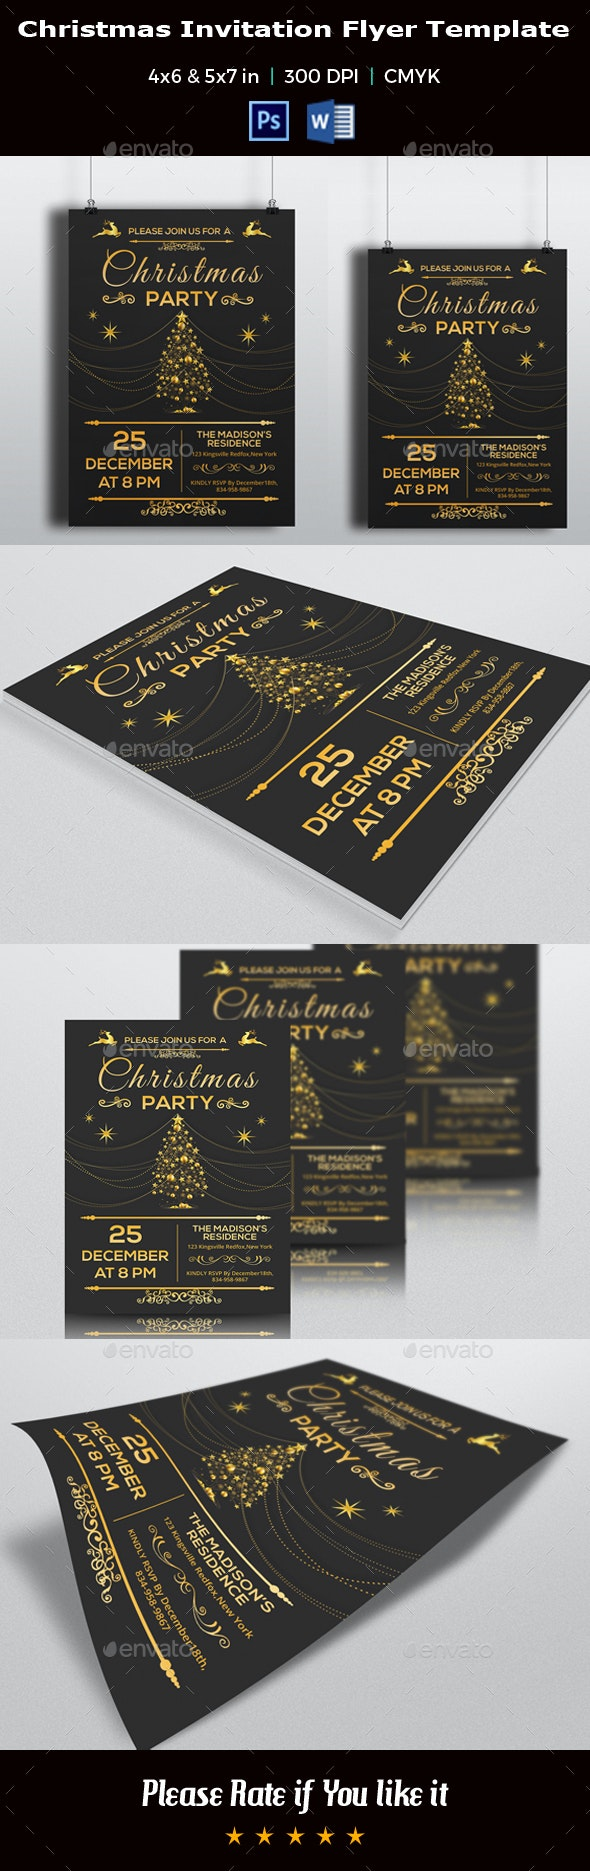 Christmas Invitation Flyer Template V02 - Events Flyers